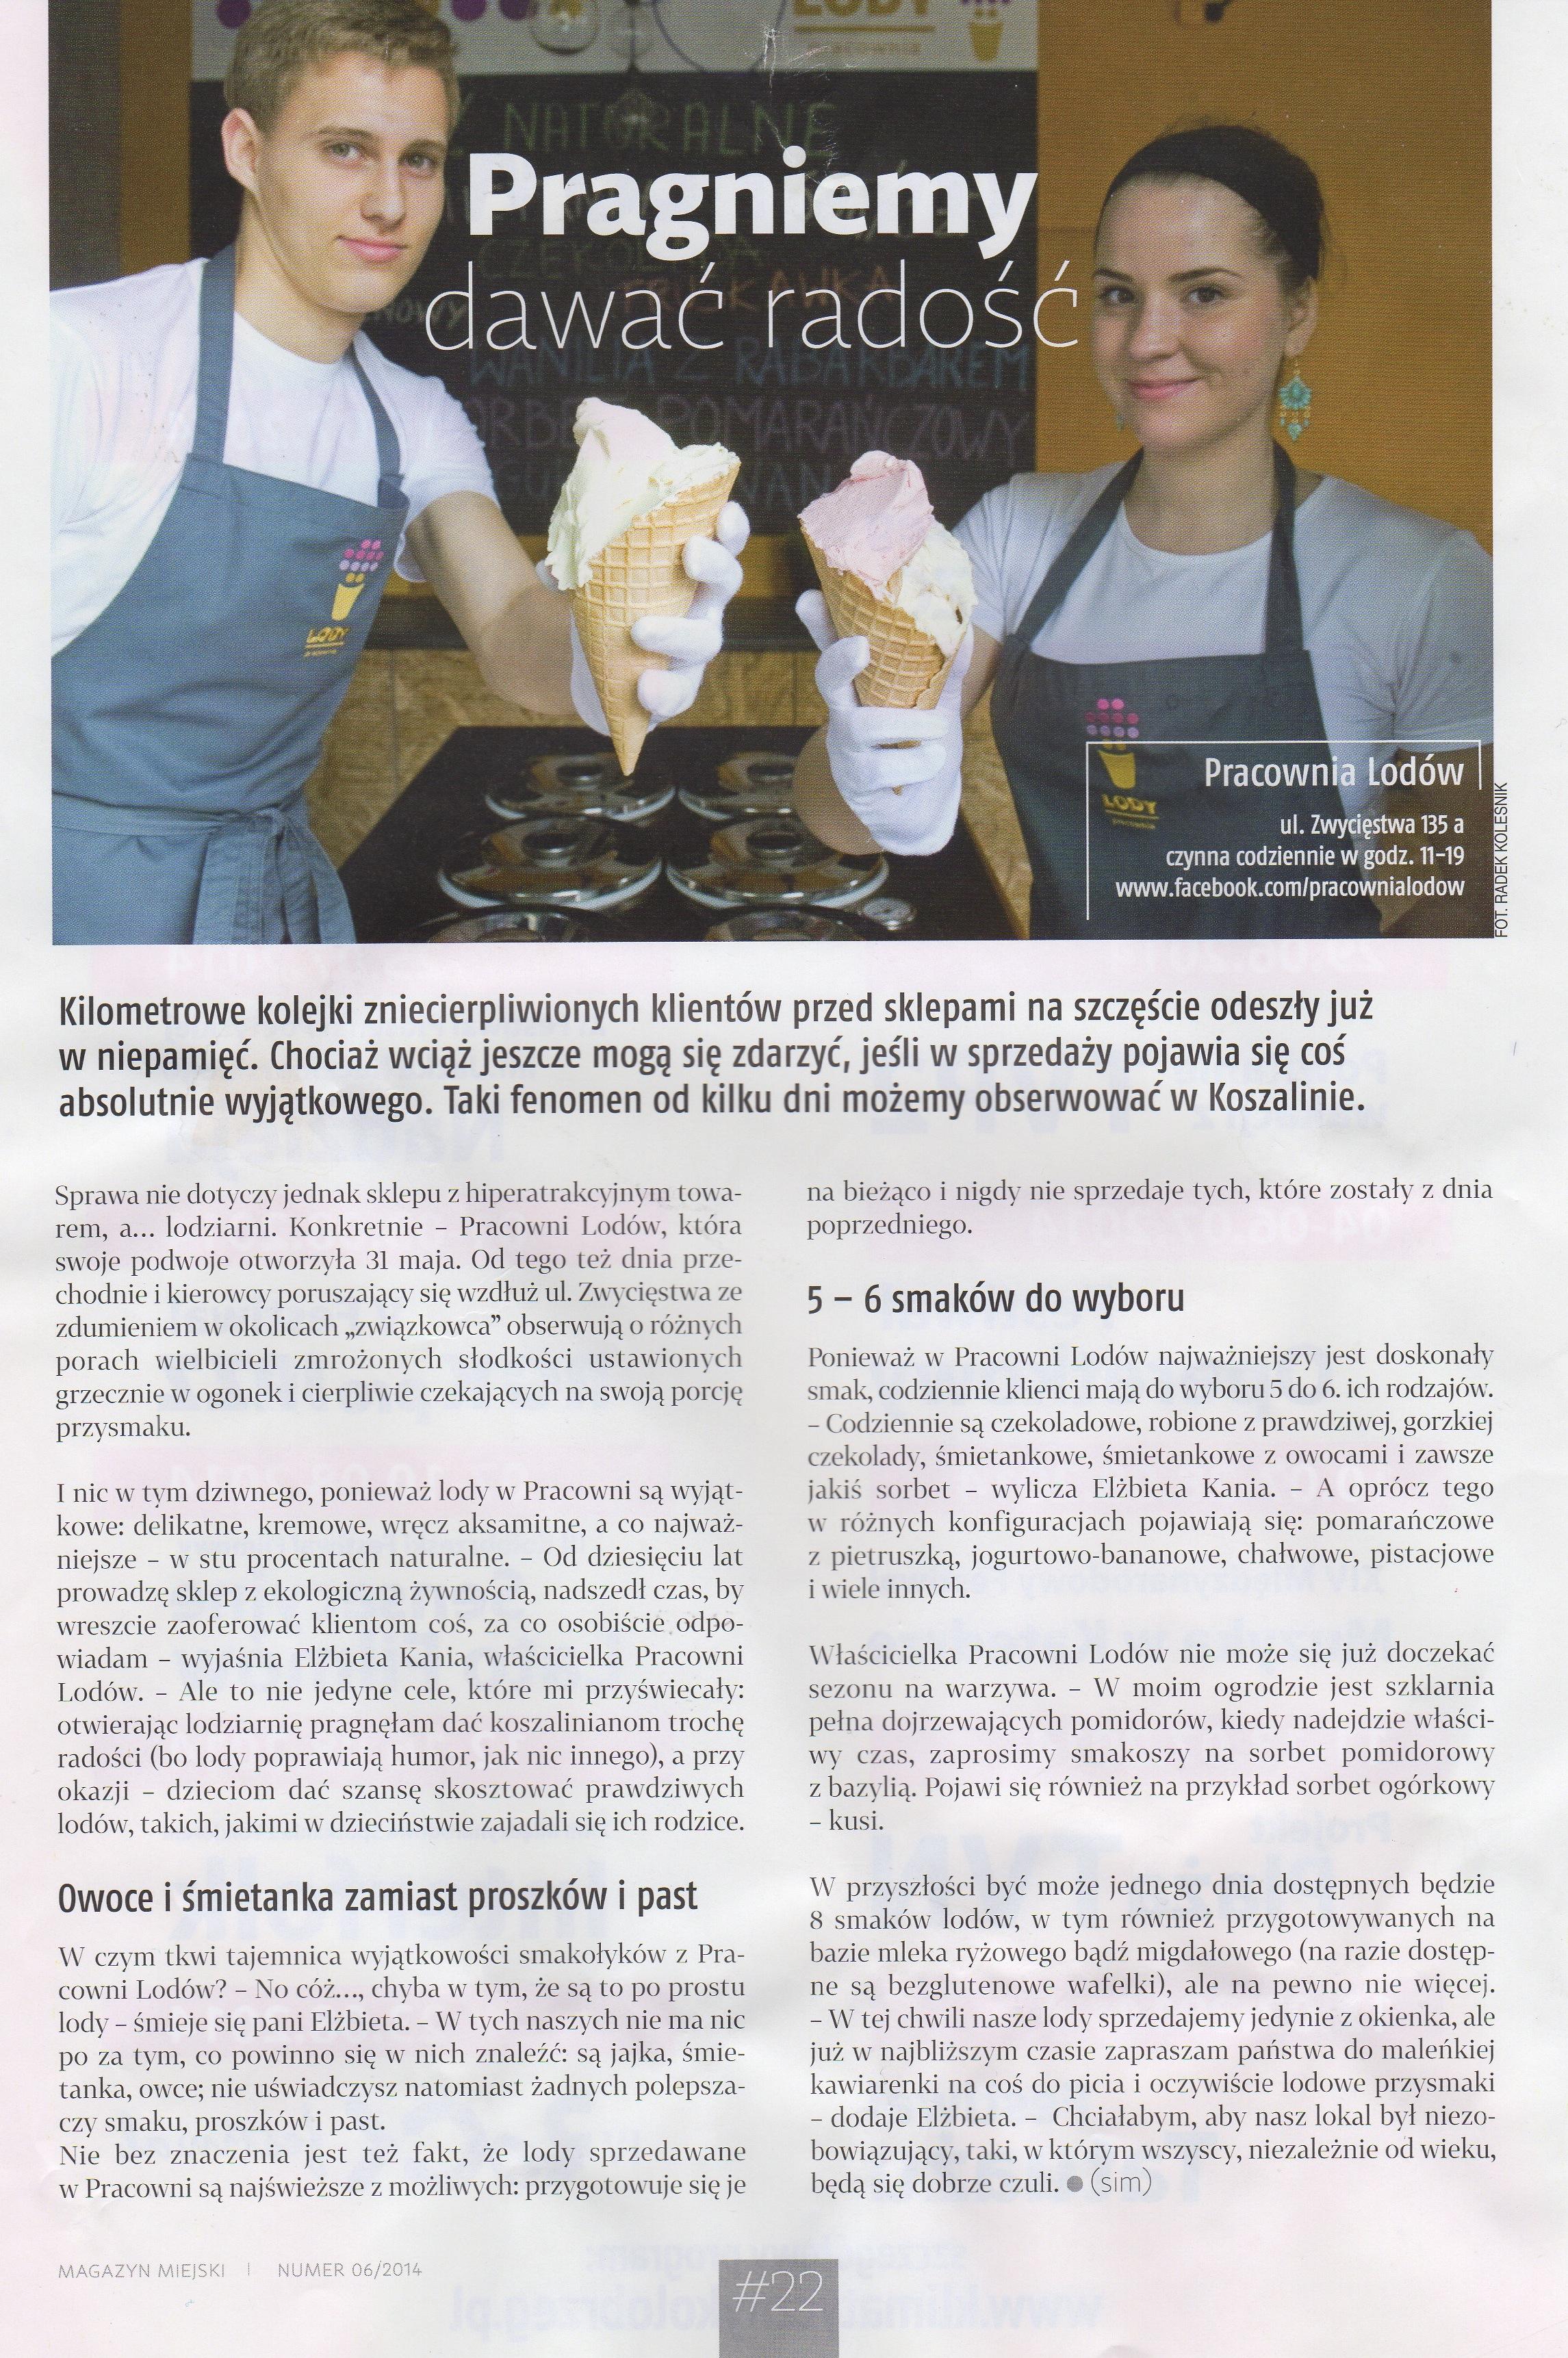 MM Trendy Magazyn Miejski 6/2014